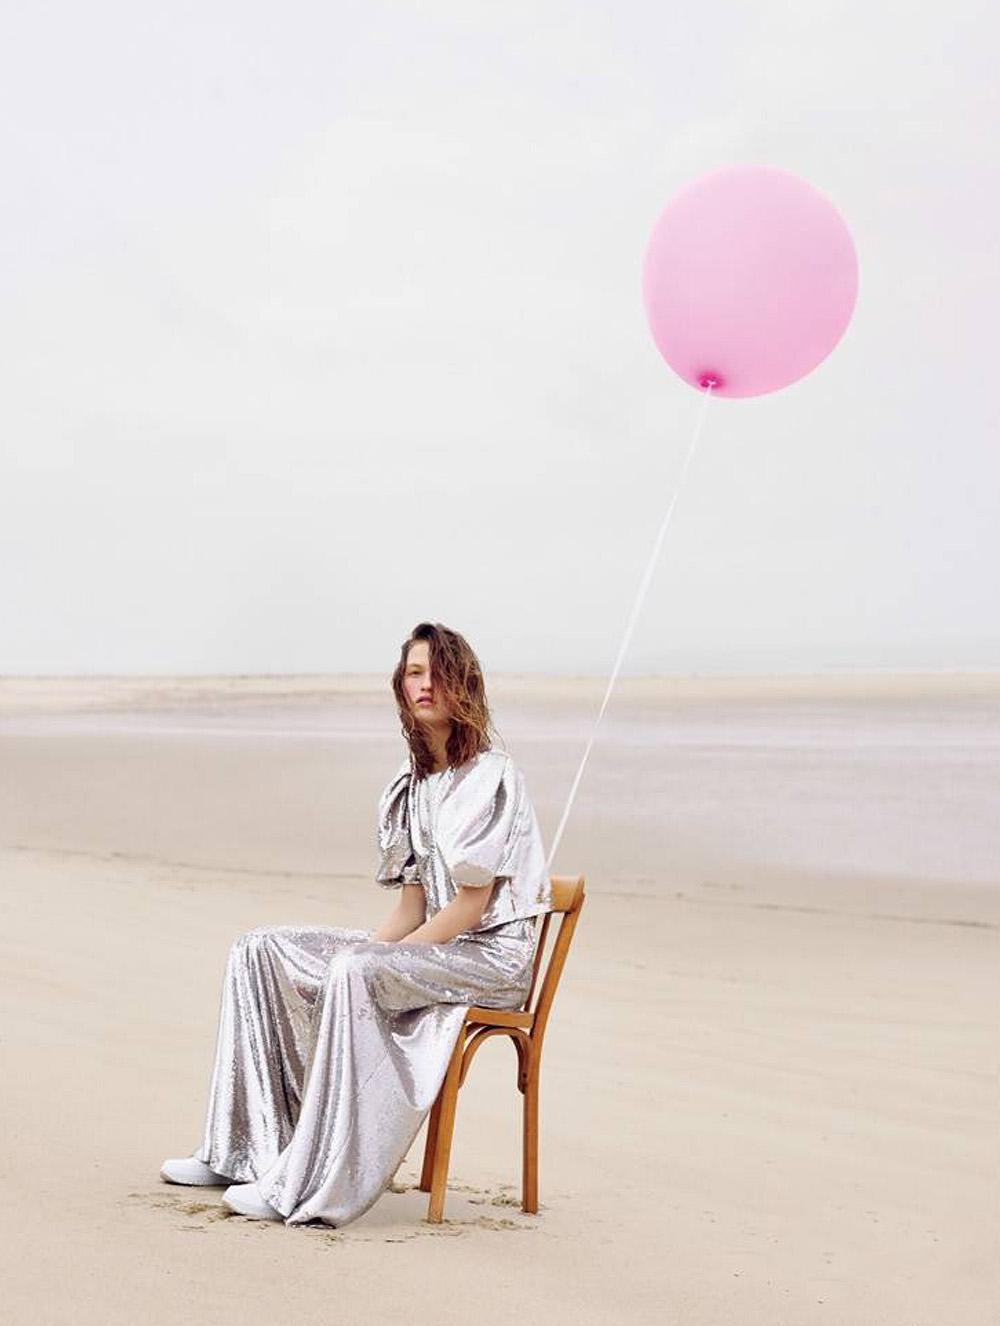 Vanya Dakovic by Jean-Baptiste Courtier for Madame Figaro January 15th, 2021